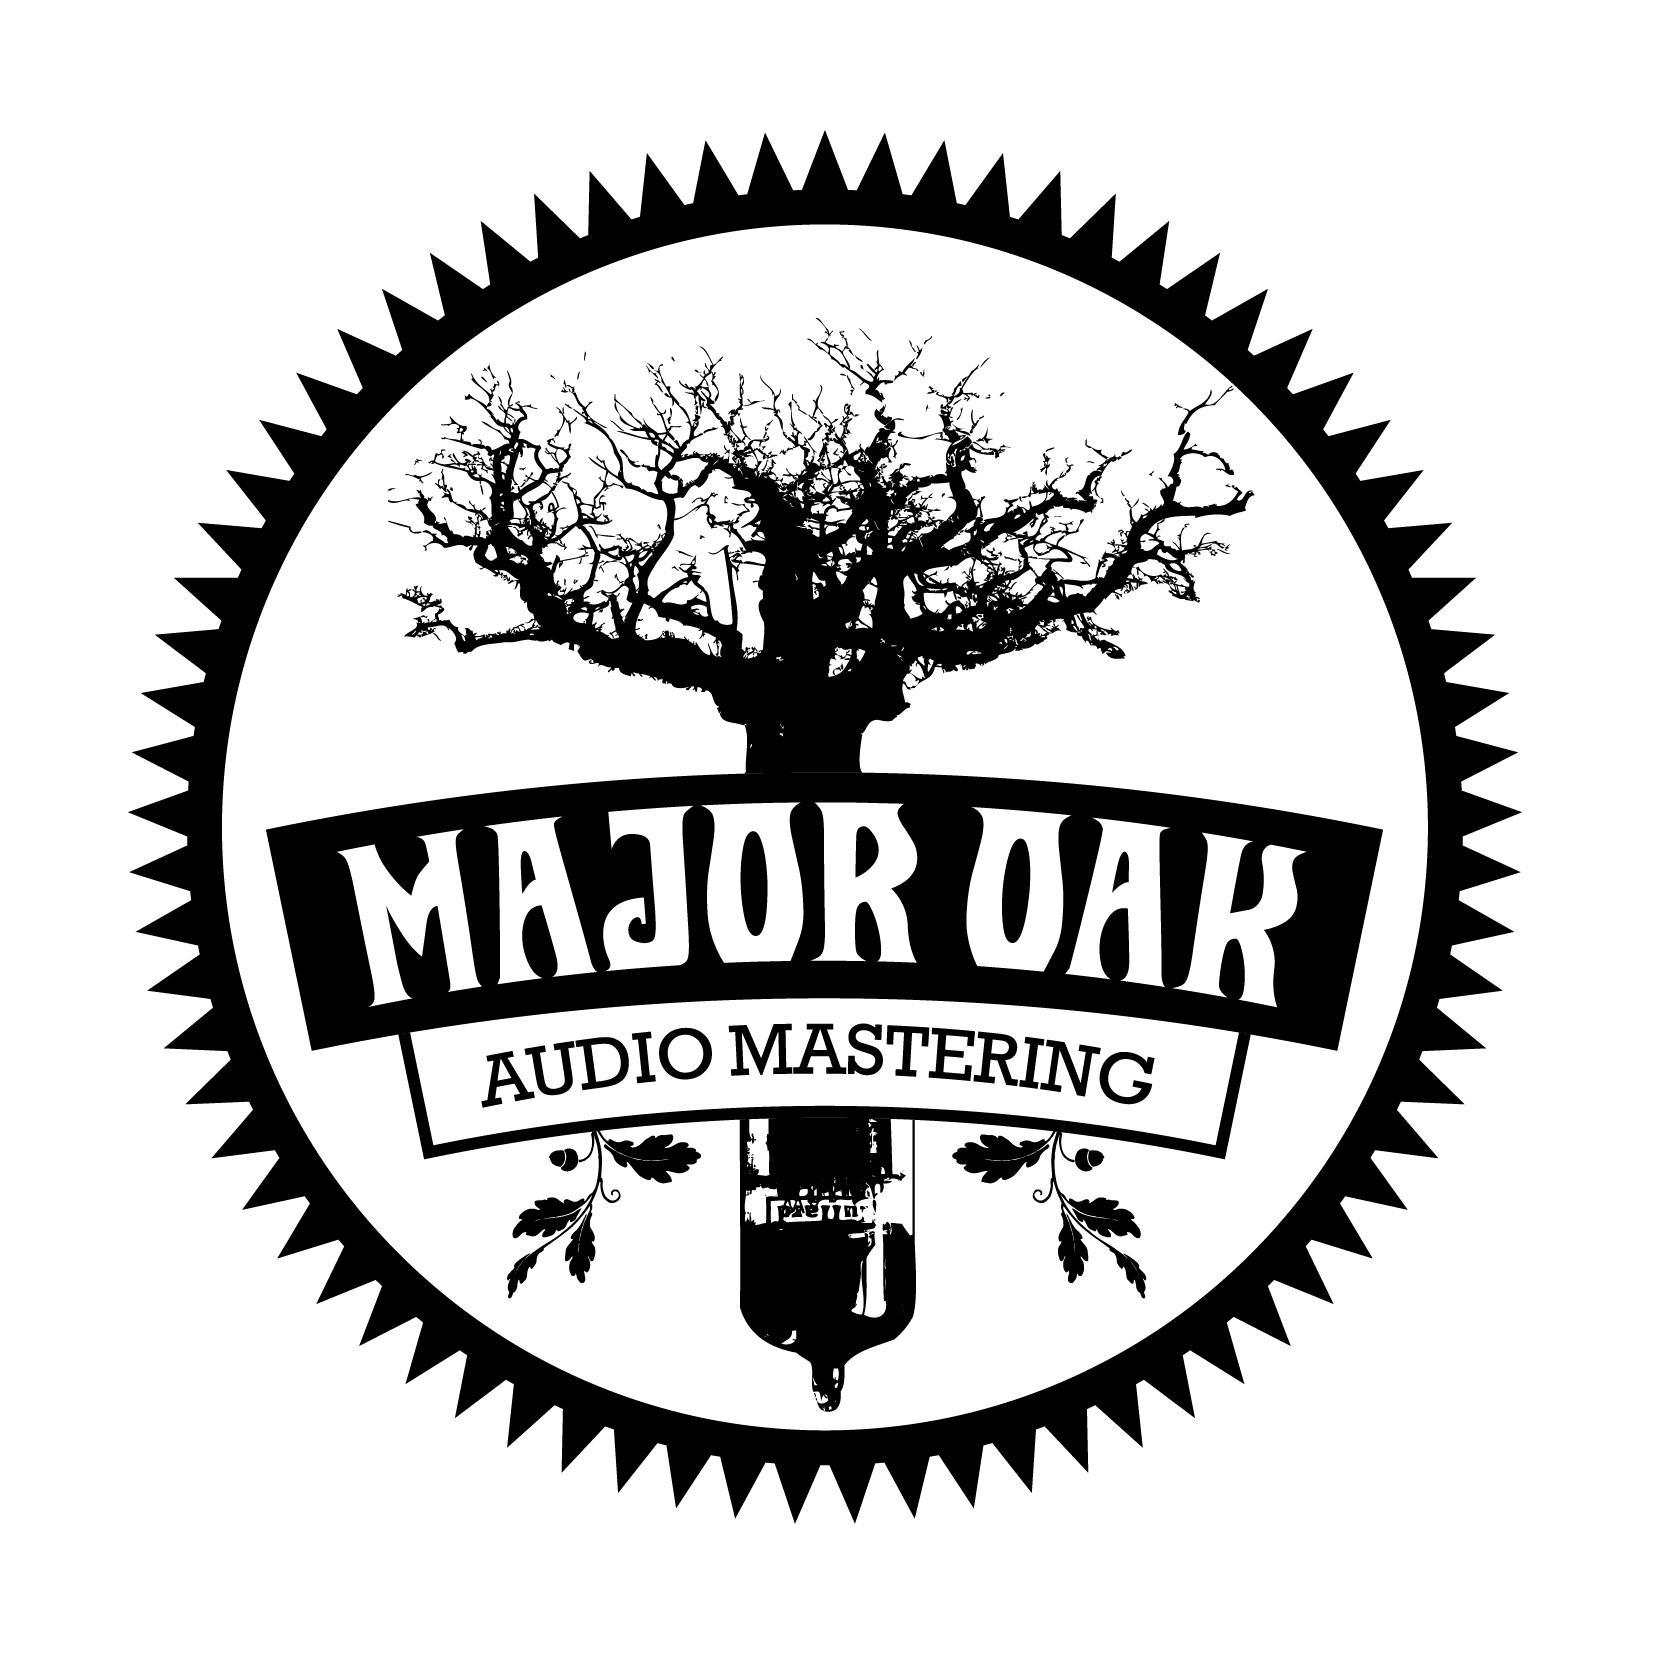 Major Oak Audio Mastering (UK)